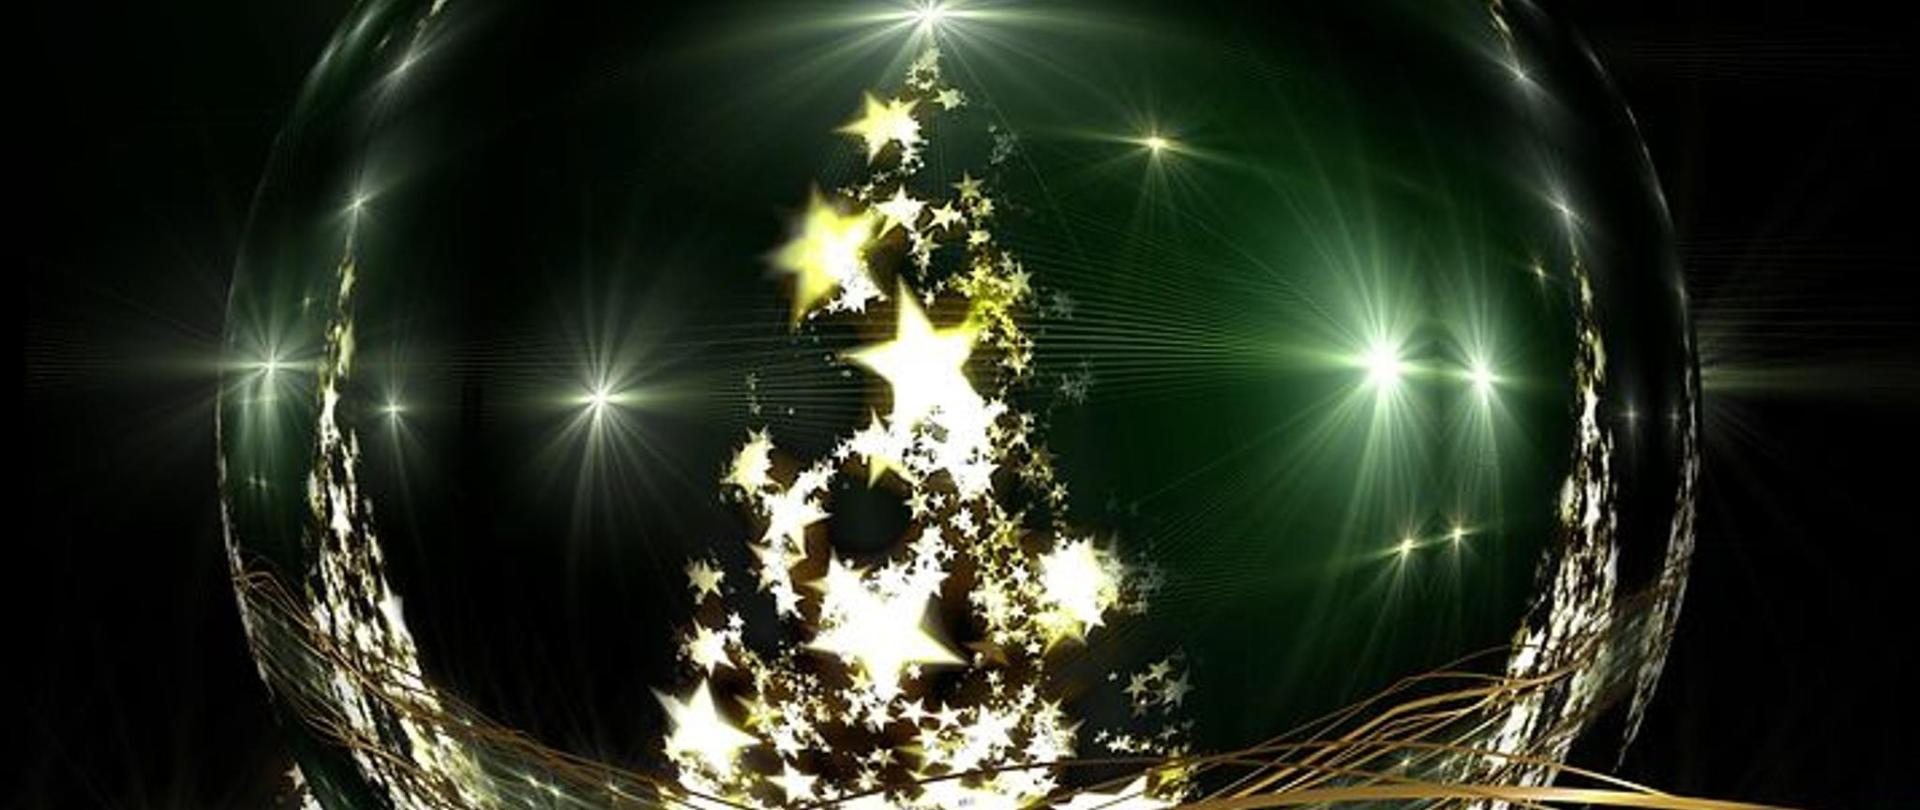 christmas-508220__480.jpg